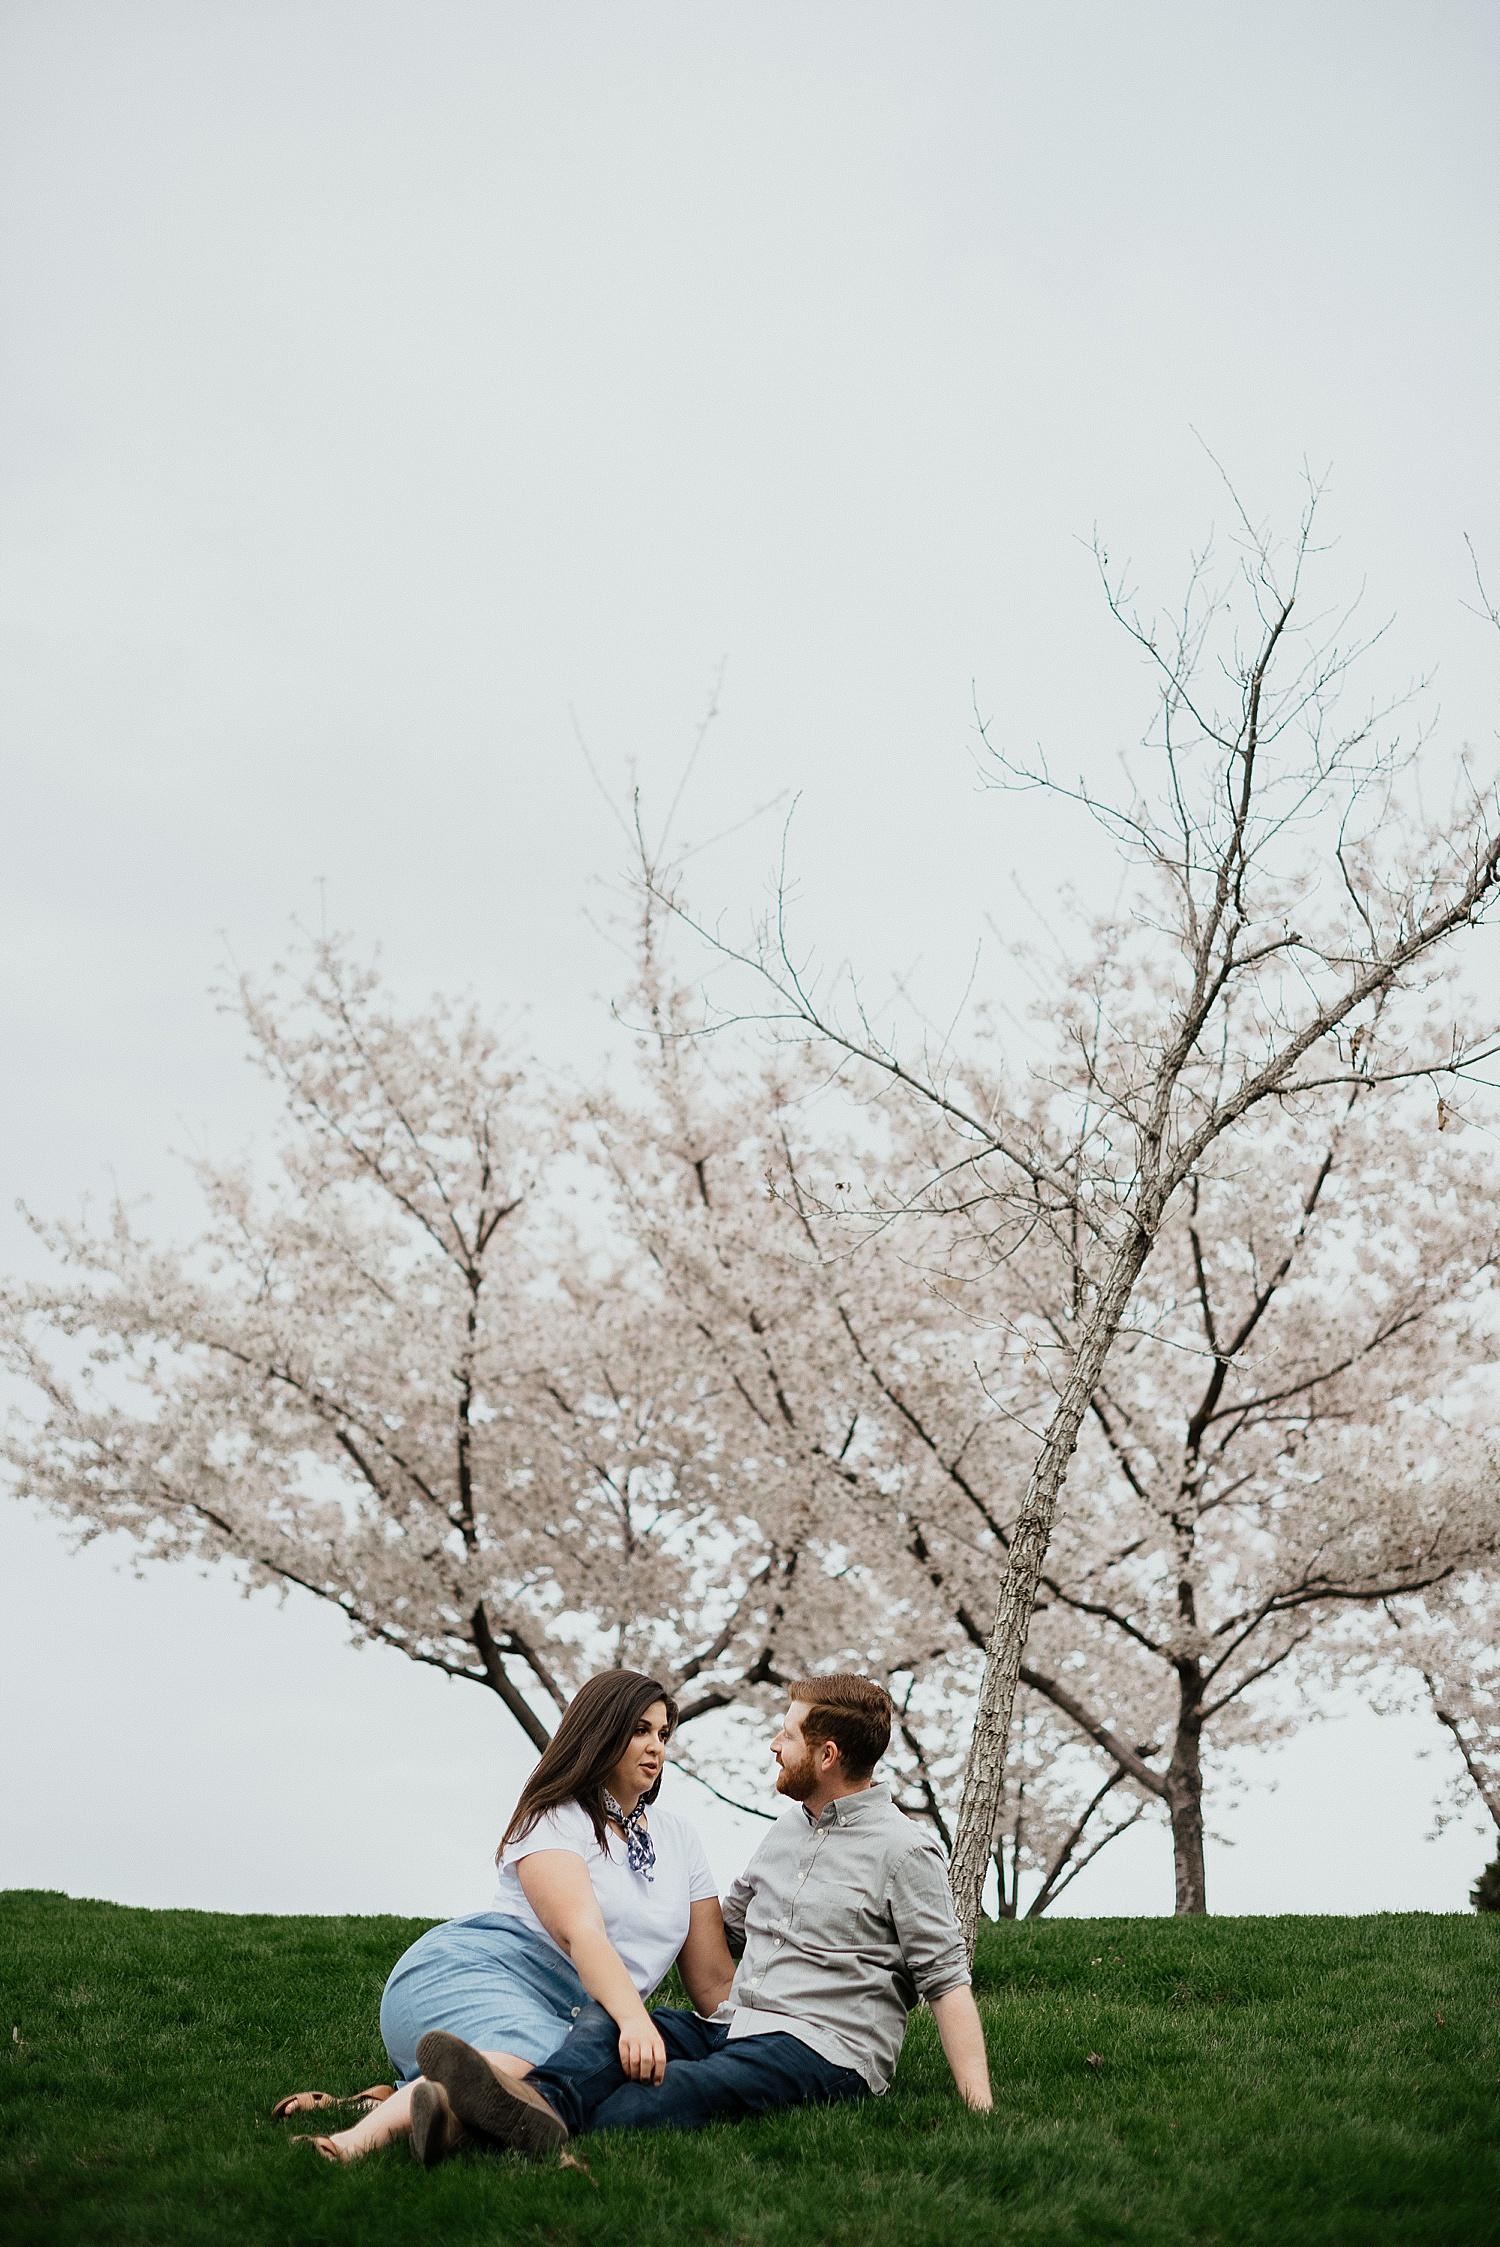 Zandra Barriga Photo - Steph and David Blossom Couples Session_0001.jpg